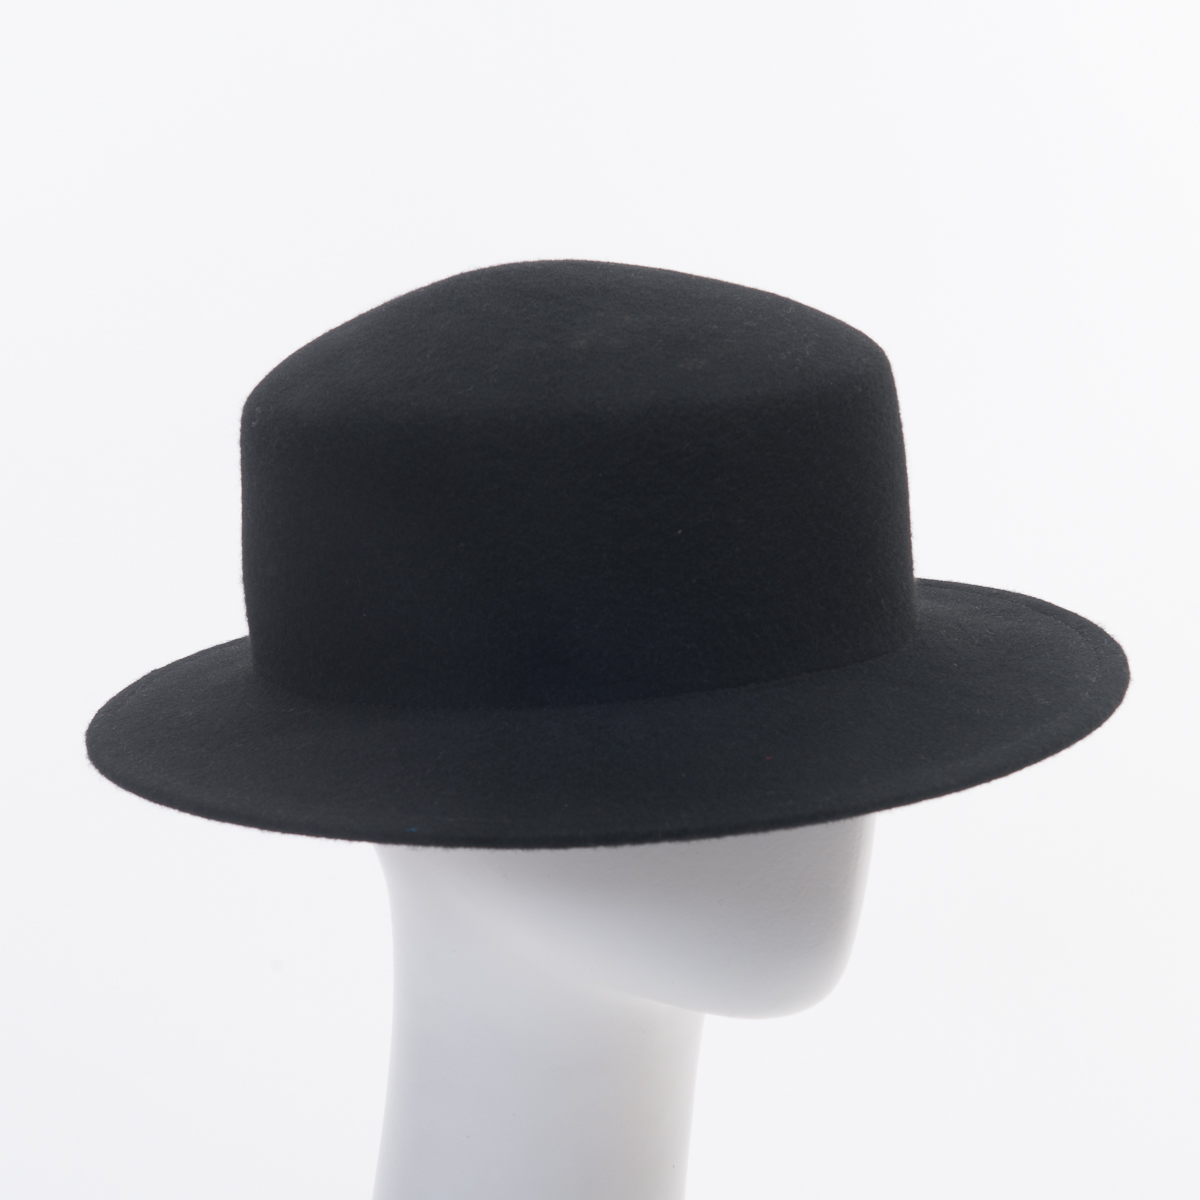 Black Small Brim Boater Felt Plain Hats-W0164A-BLACK- Sun Yorkos  6d08b9f9ee2